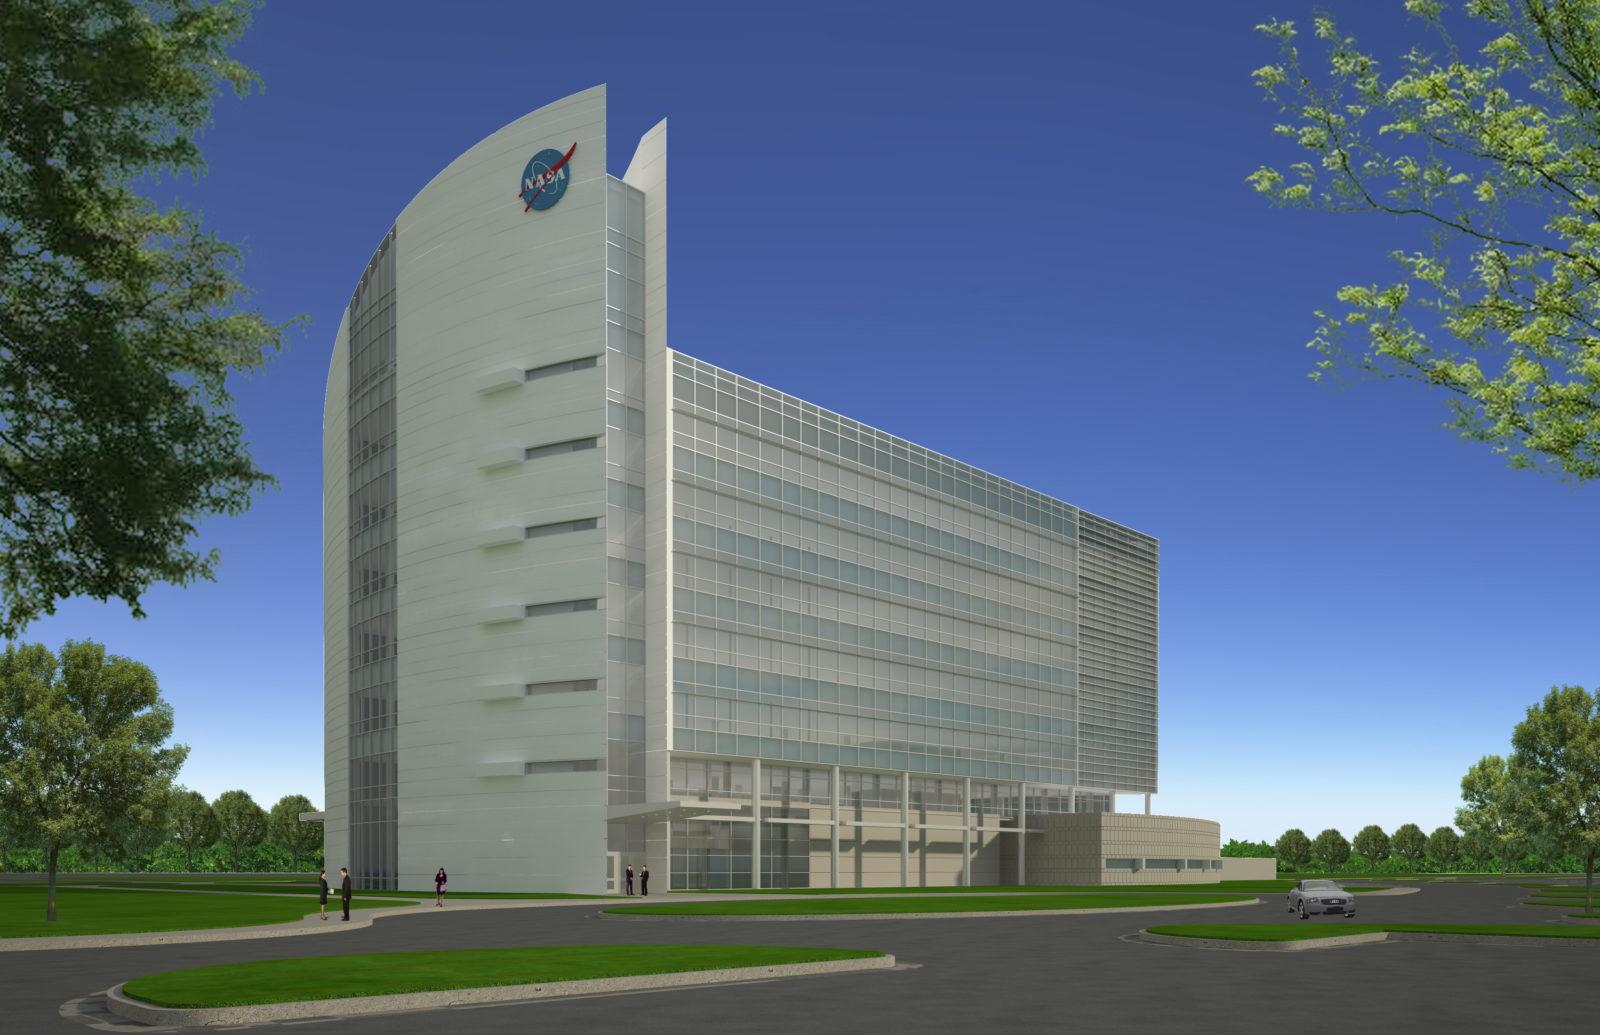 NASA mission statement and vision statement analysis